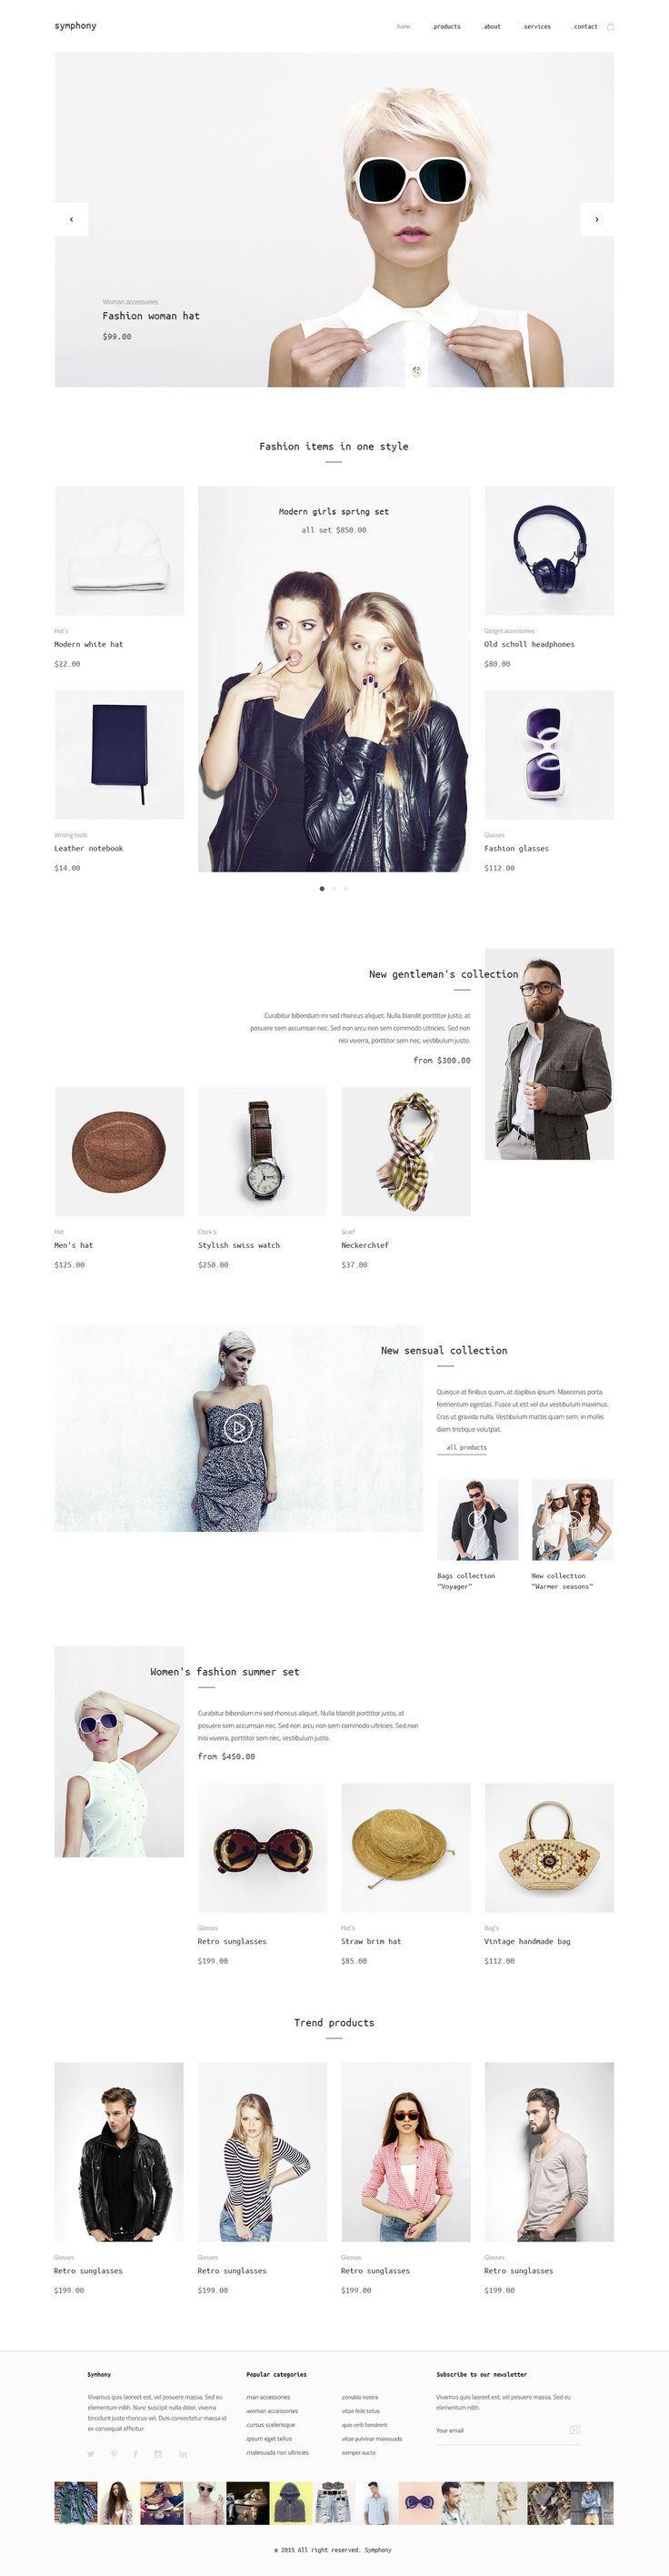 Web design inspiration | #1192